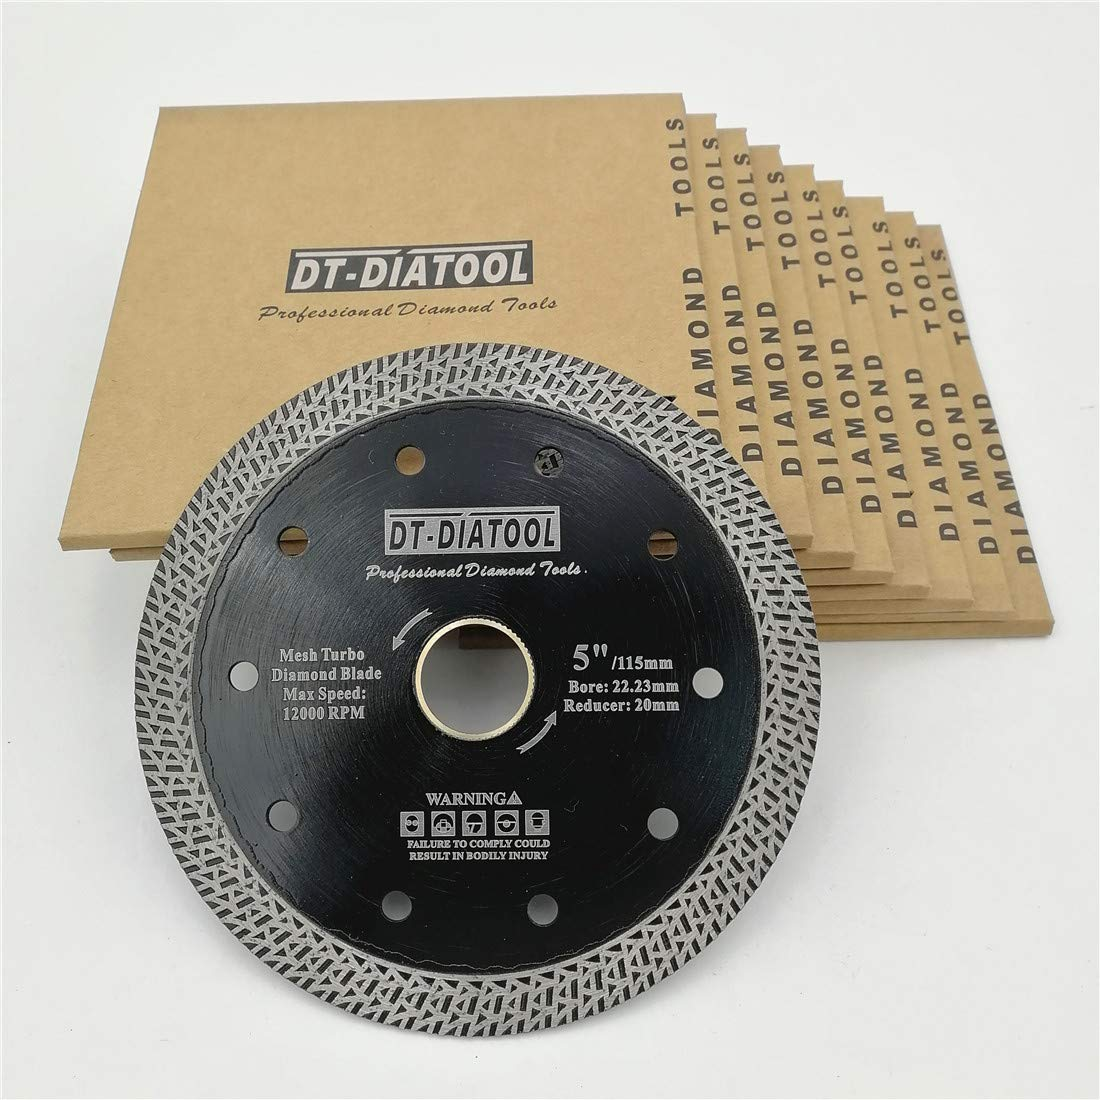 DT-DIATOOL Mesh Turbo Diamond Blade Hot Pressed Sintered Granite Marble Tile Ceramic Brick Diamond Cutting Disc Diameter 5 Inch Pack of 10